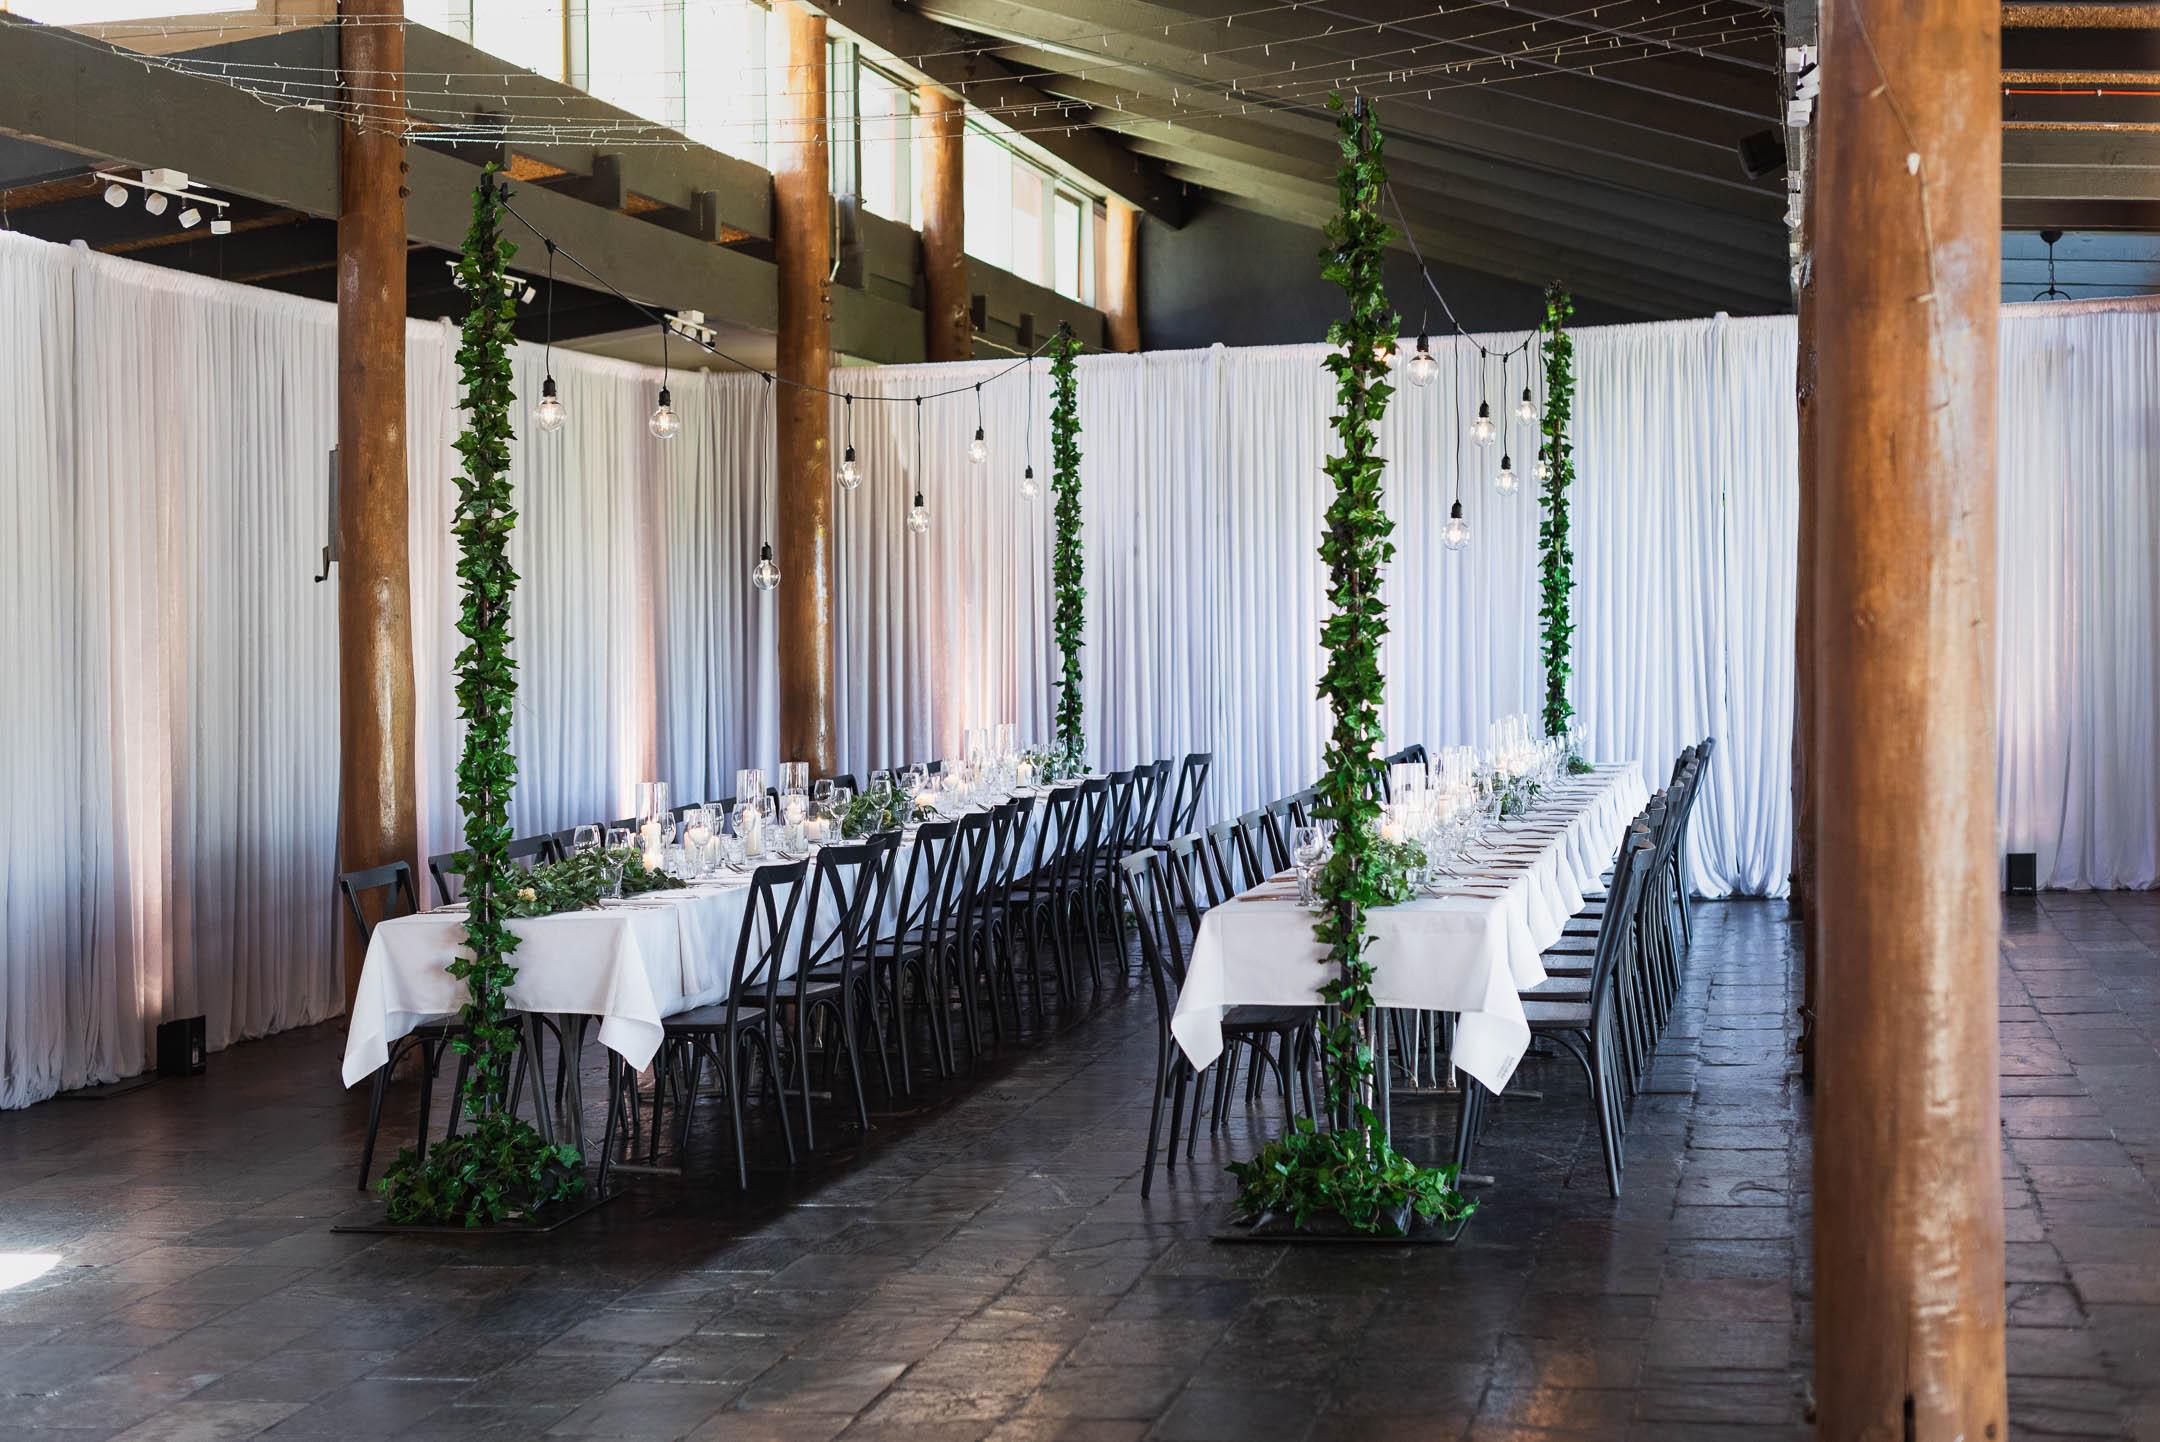 Fergusson winery wedding with festoon lighting